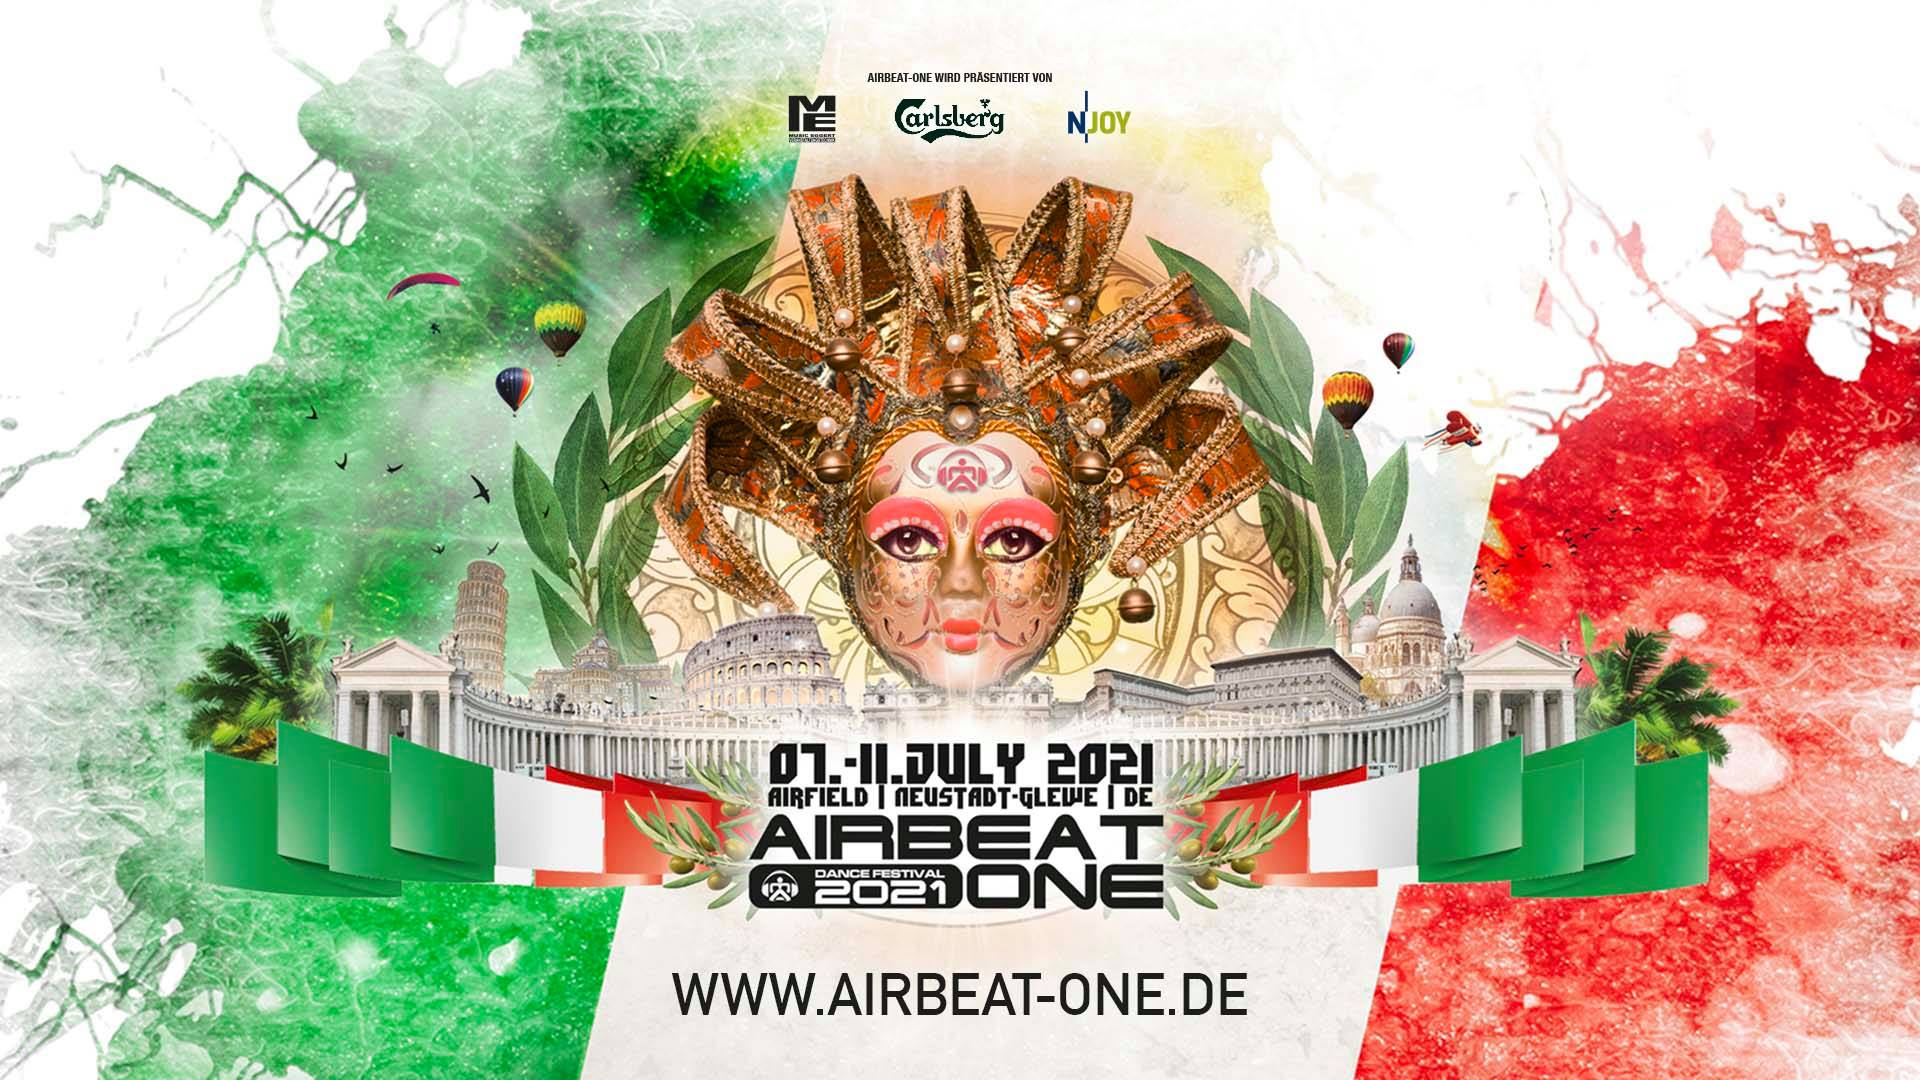 Airbeat One Festival 2021 - Festicket